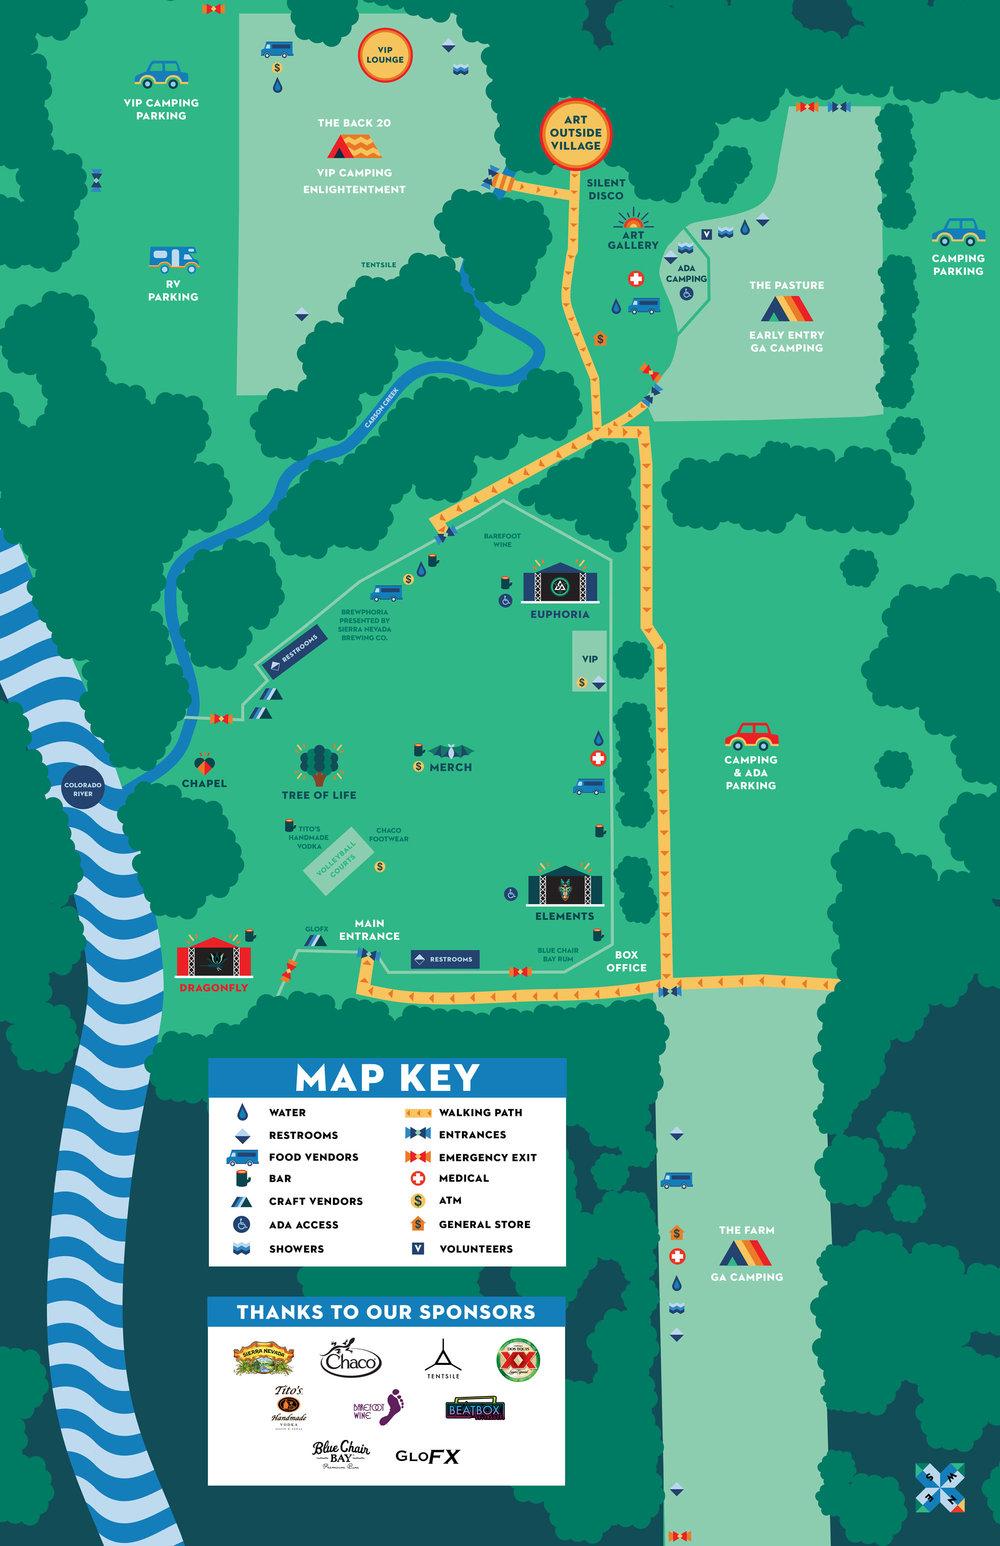 euphoria_2017_map.jpg